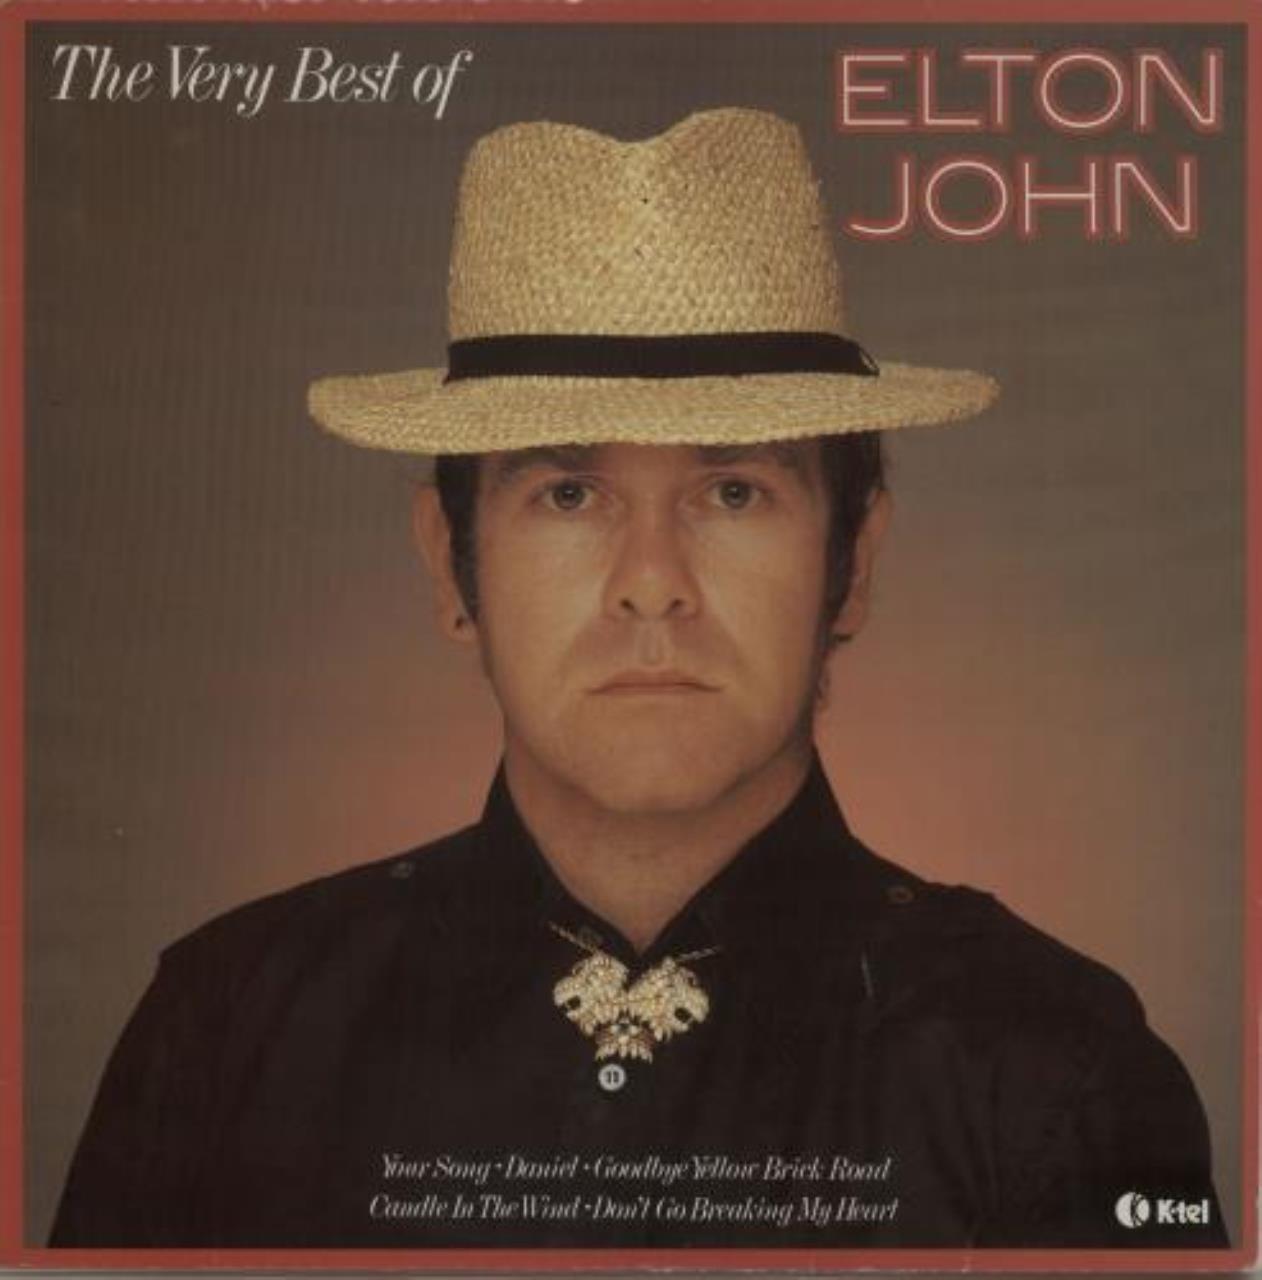 Elton John - Elton John / The Very Best Of Elton John - Amazon.com Music